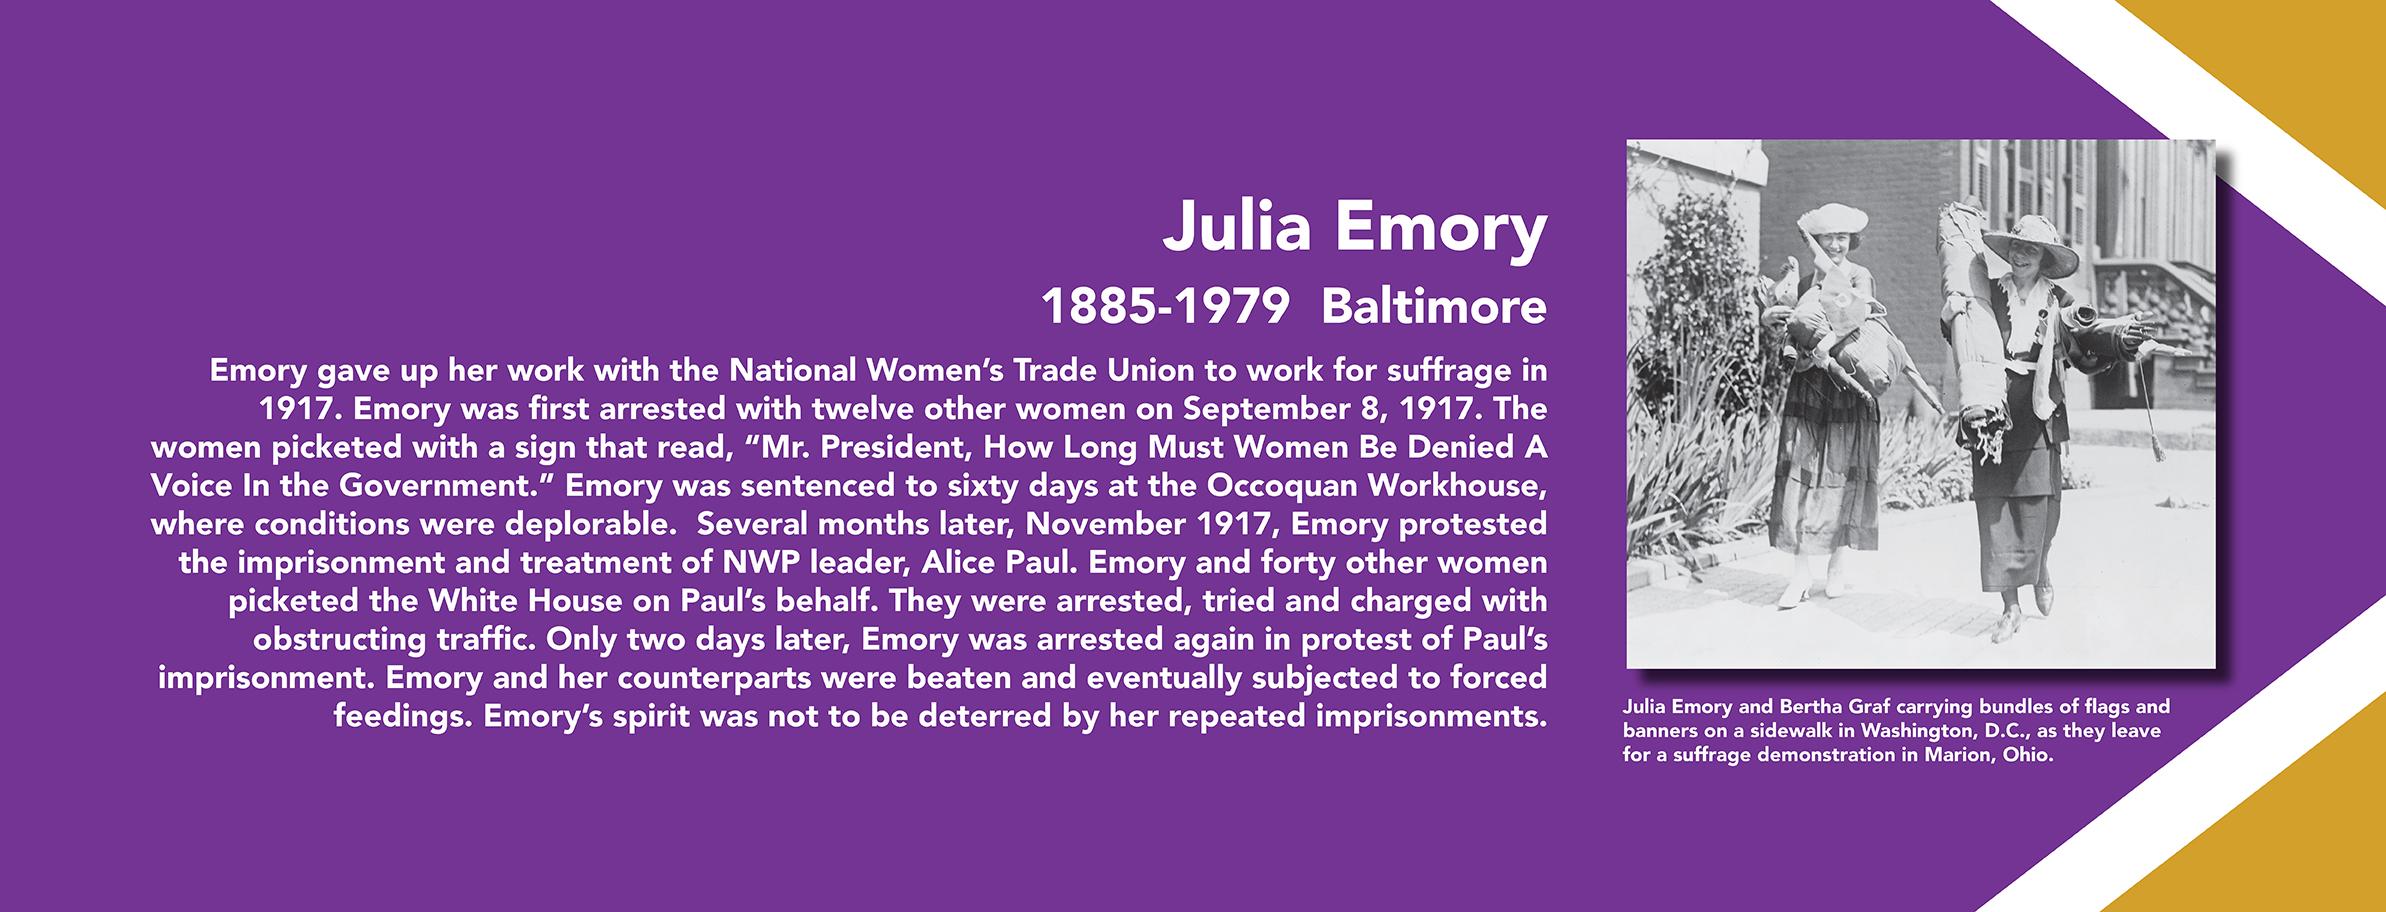 Julia Emory